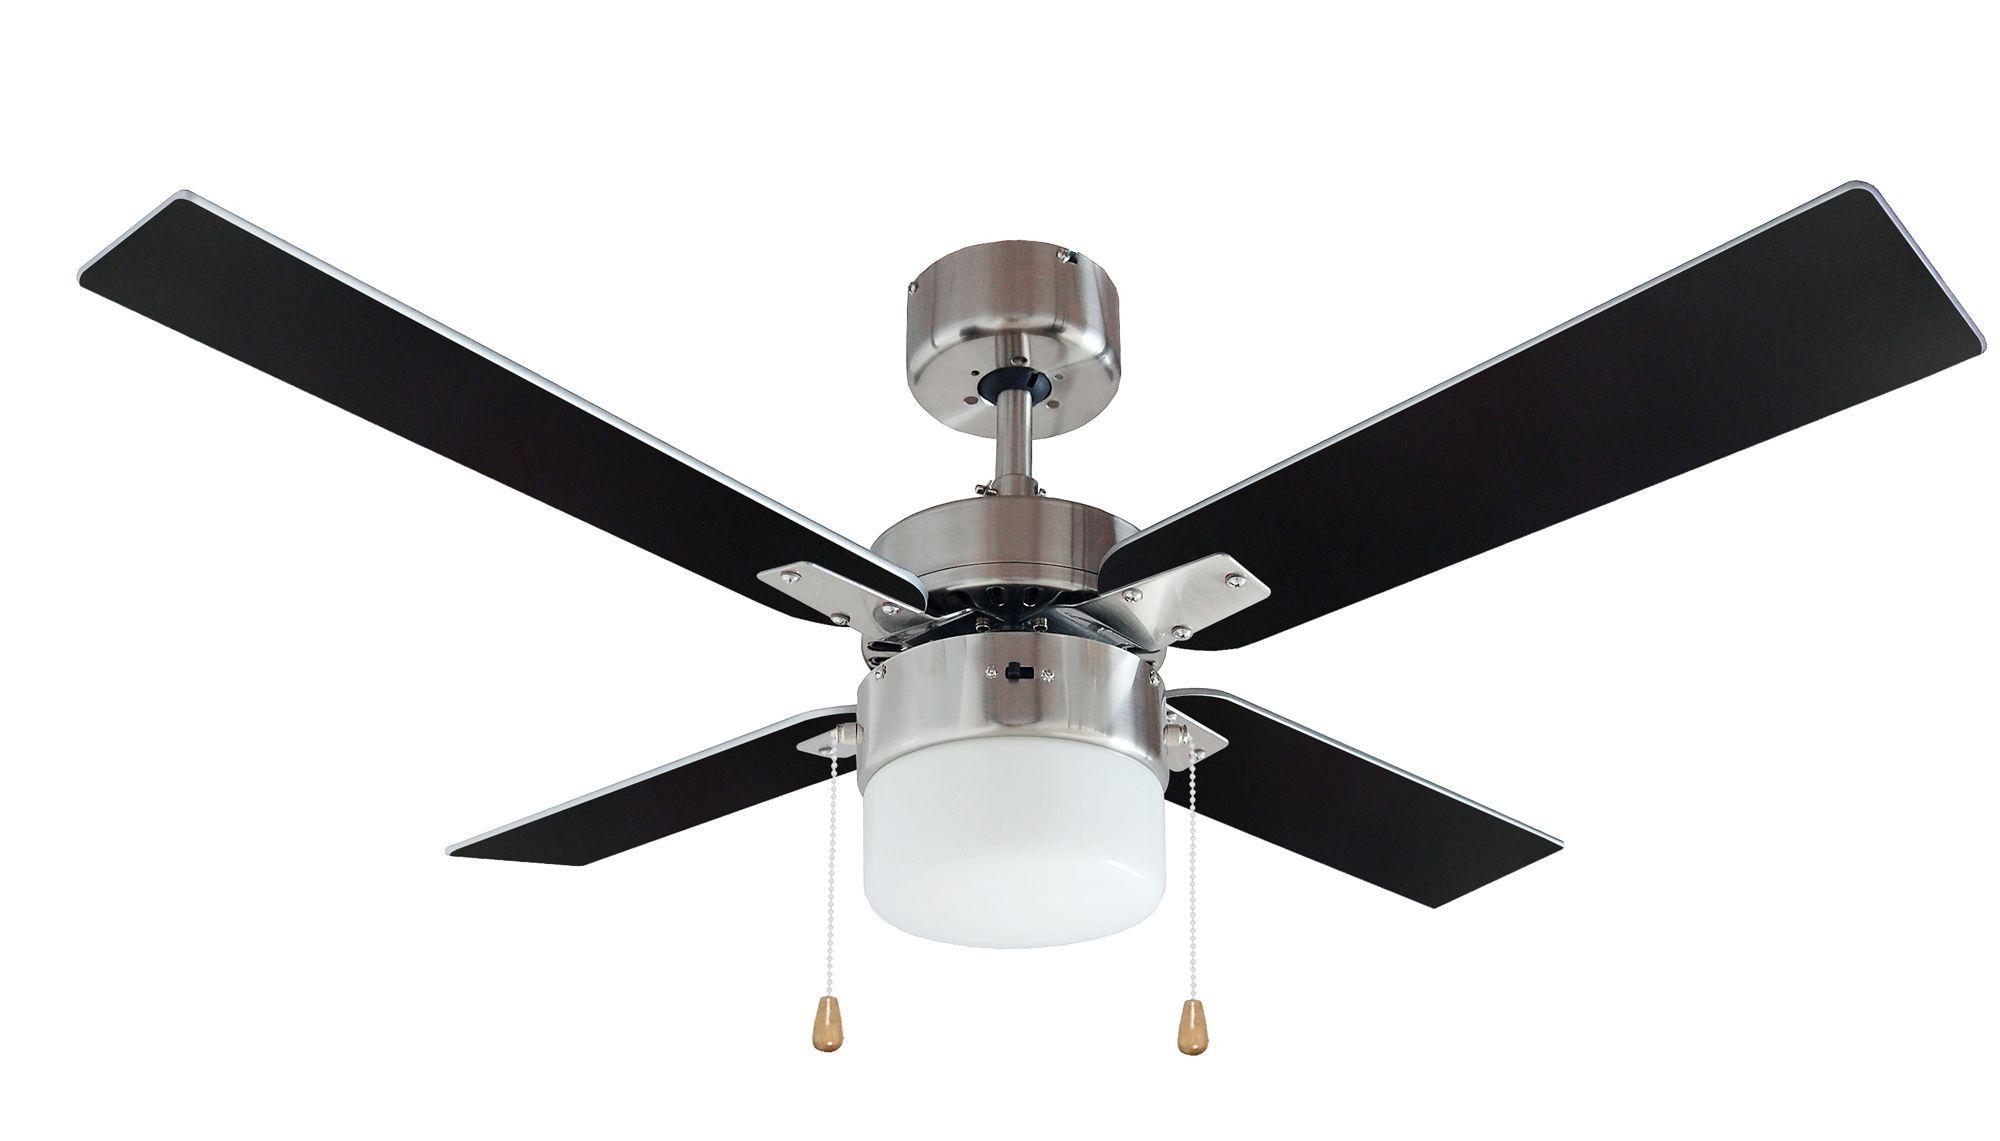 San antonio black brushed chrome effect ceiling fan light ceiling san antonio black brushed chrome effect ceiling fan light mozeypictures Gallery